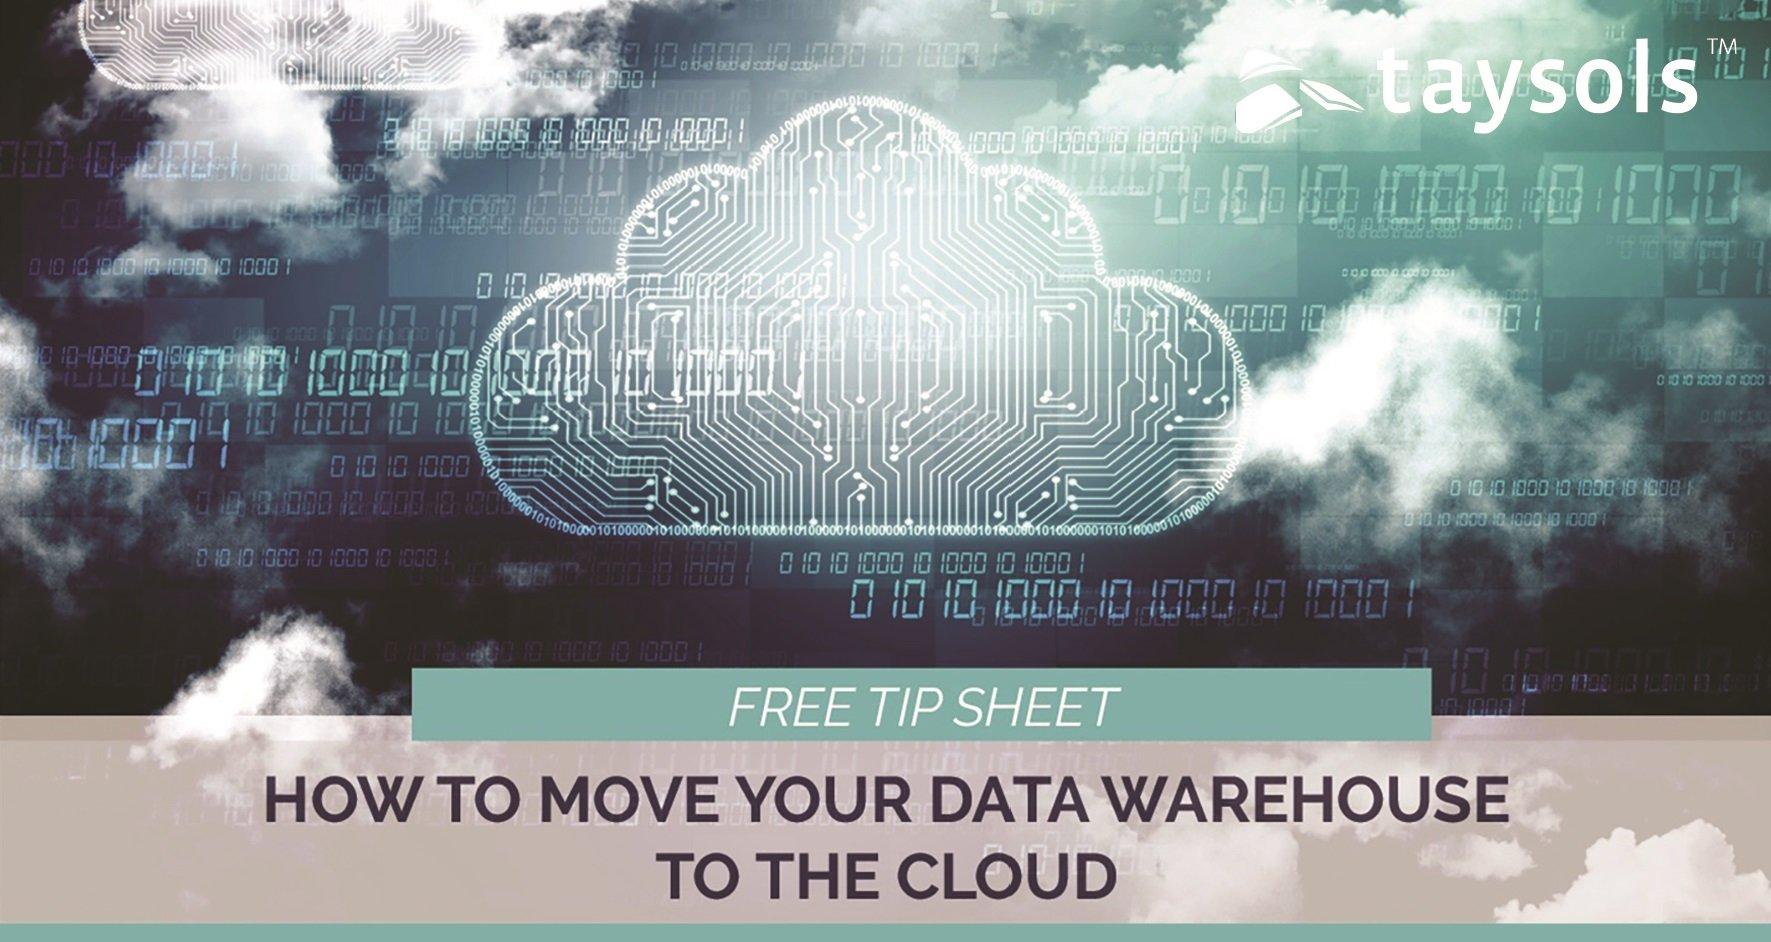 taysols_tipsheet_Migrating to the Cloud_hubspot